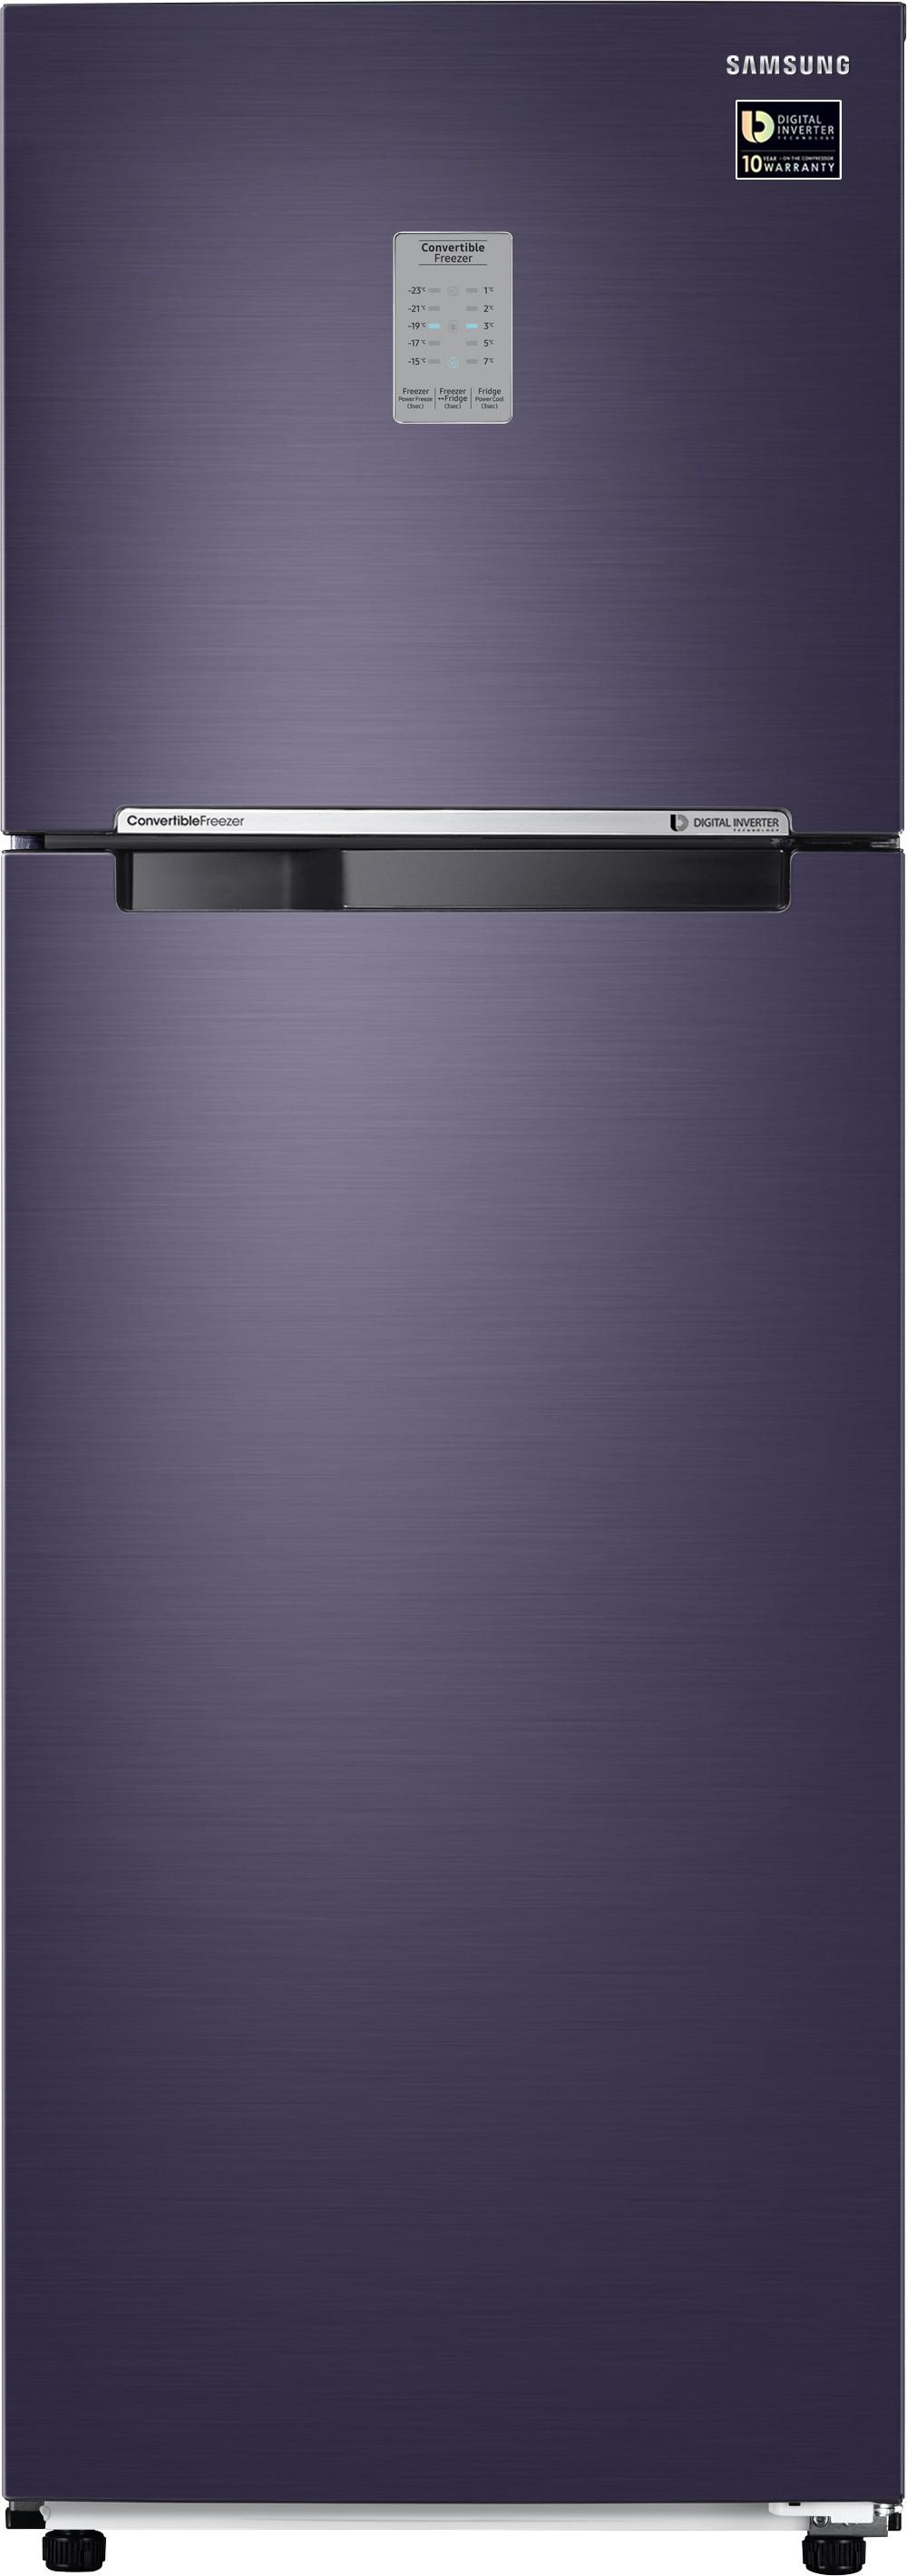 SAMSUNG 321 L Frost Free Double Door Refrigerator(RT34M3743UT/HL, Pebble Blue, 2017) (Samsung) Tamil Nadu Buy Online